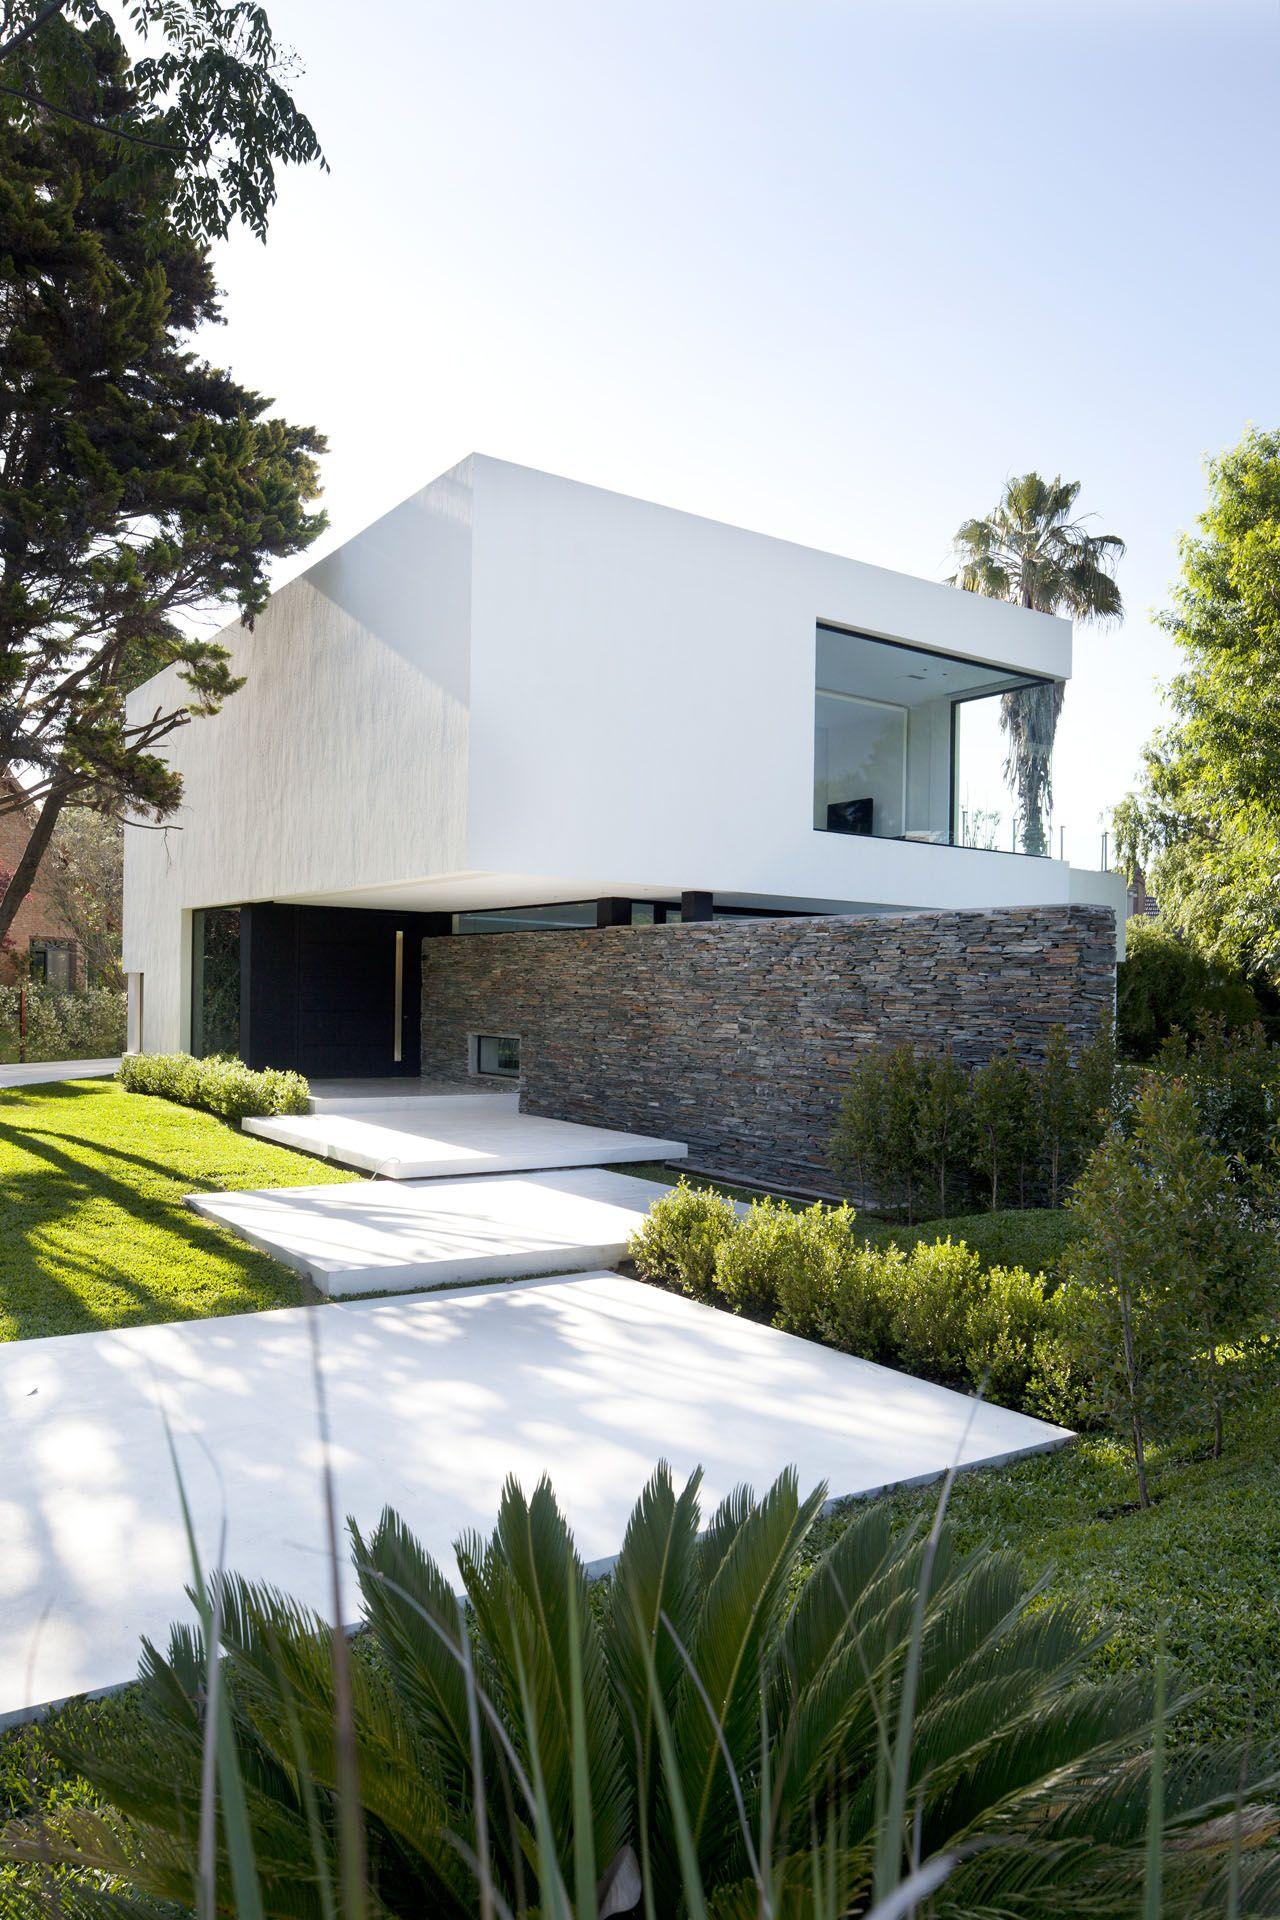 Bestes hausfrontdesign tumblr  外観  pinterest  architecture house and modern